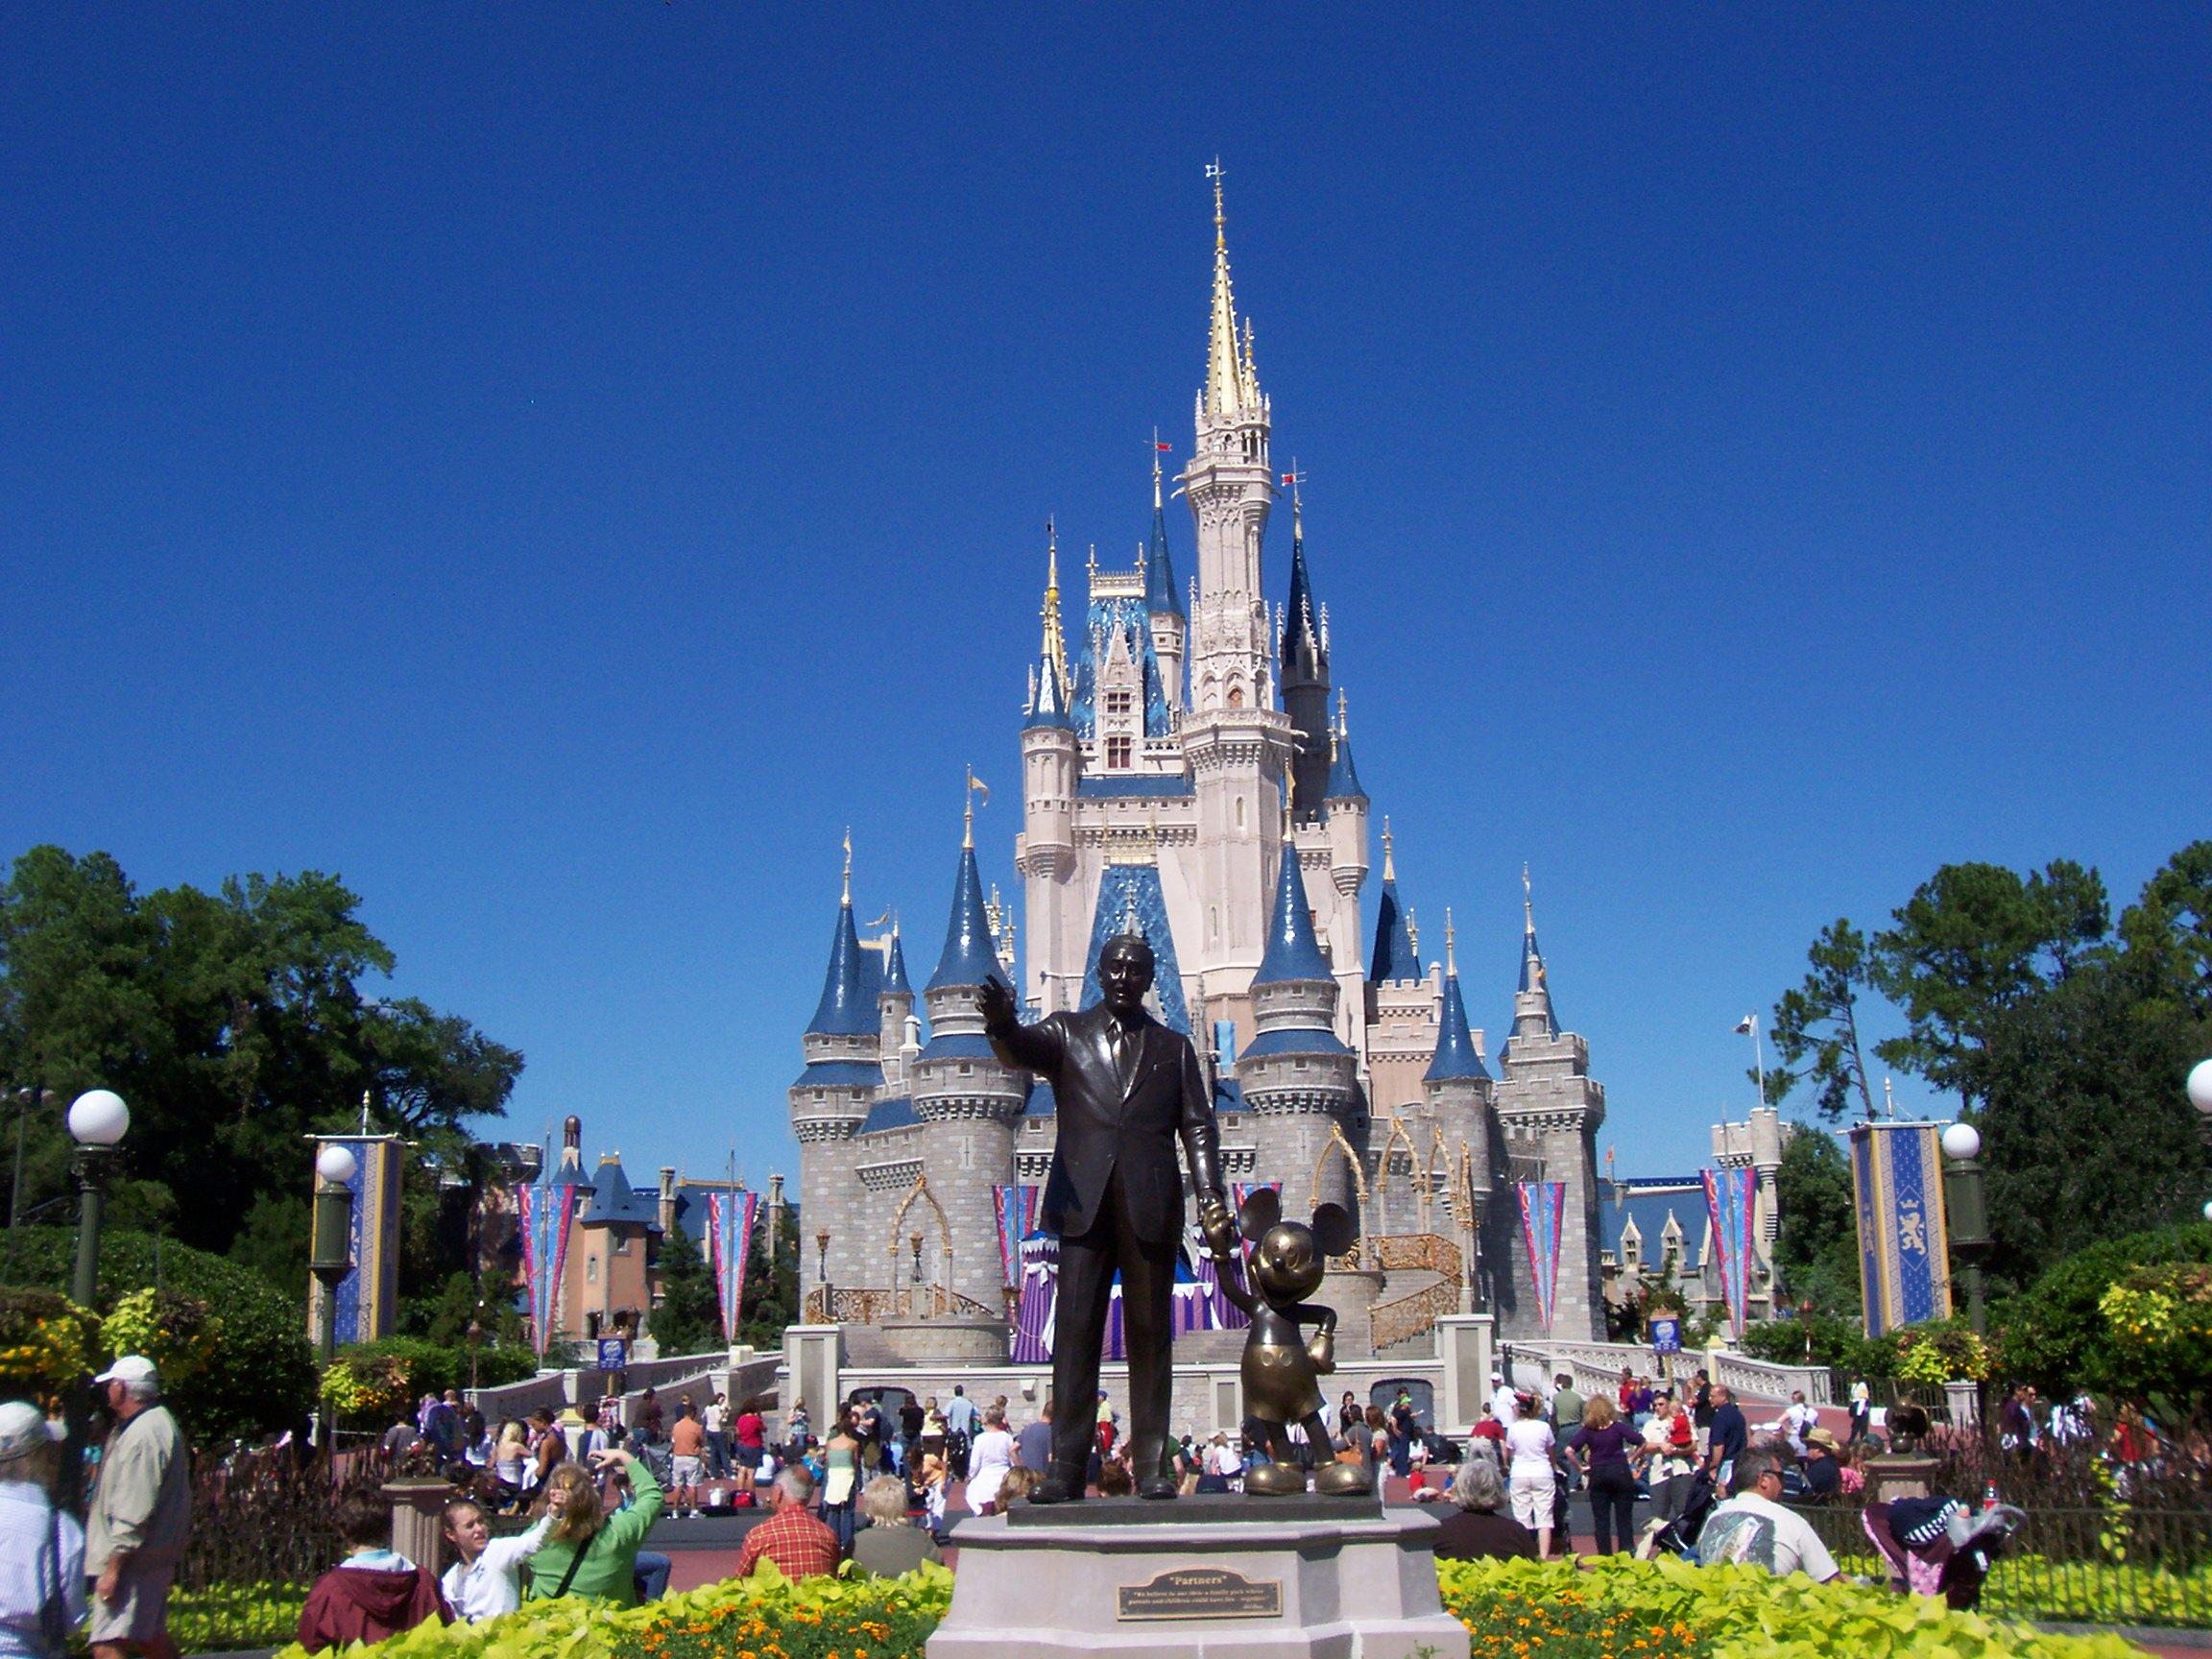 http://www.prasannaholidays.com/wp-content/uploads/2014/06/Magic-Kingdom-8.jpg